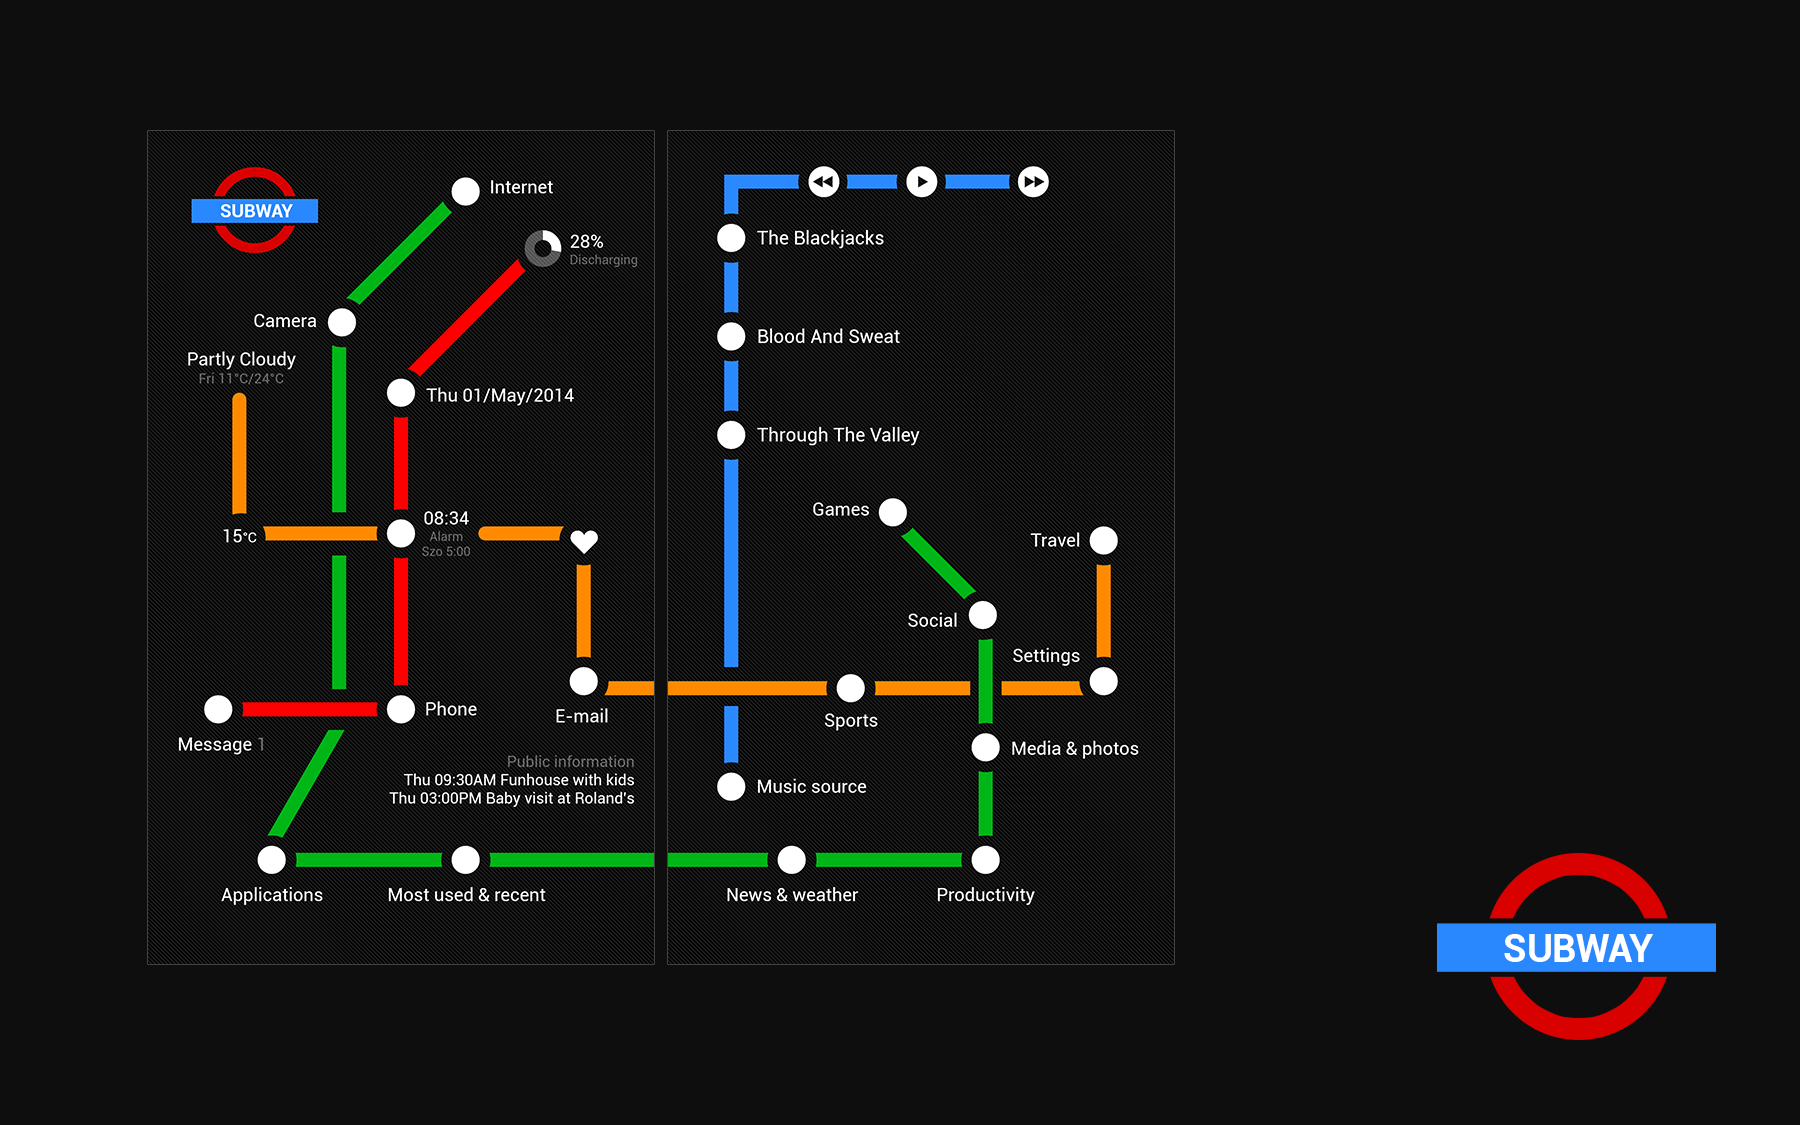 subway_mcs_original